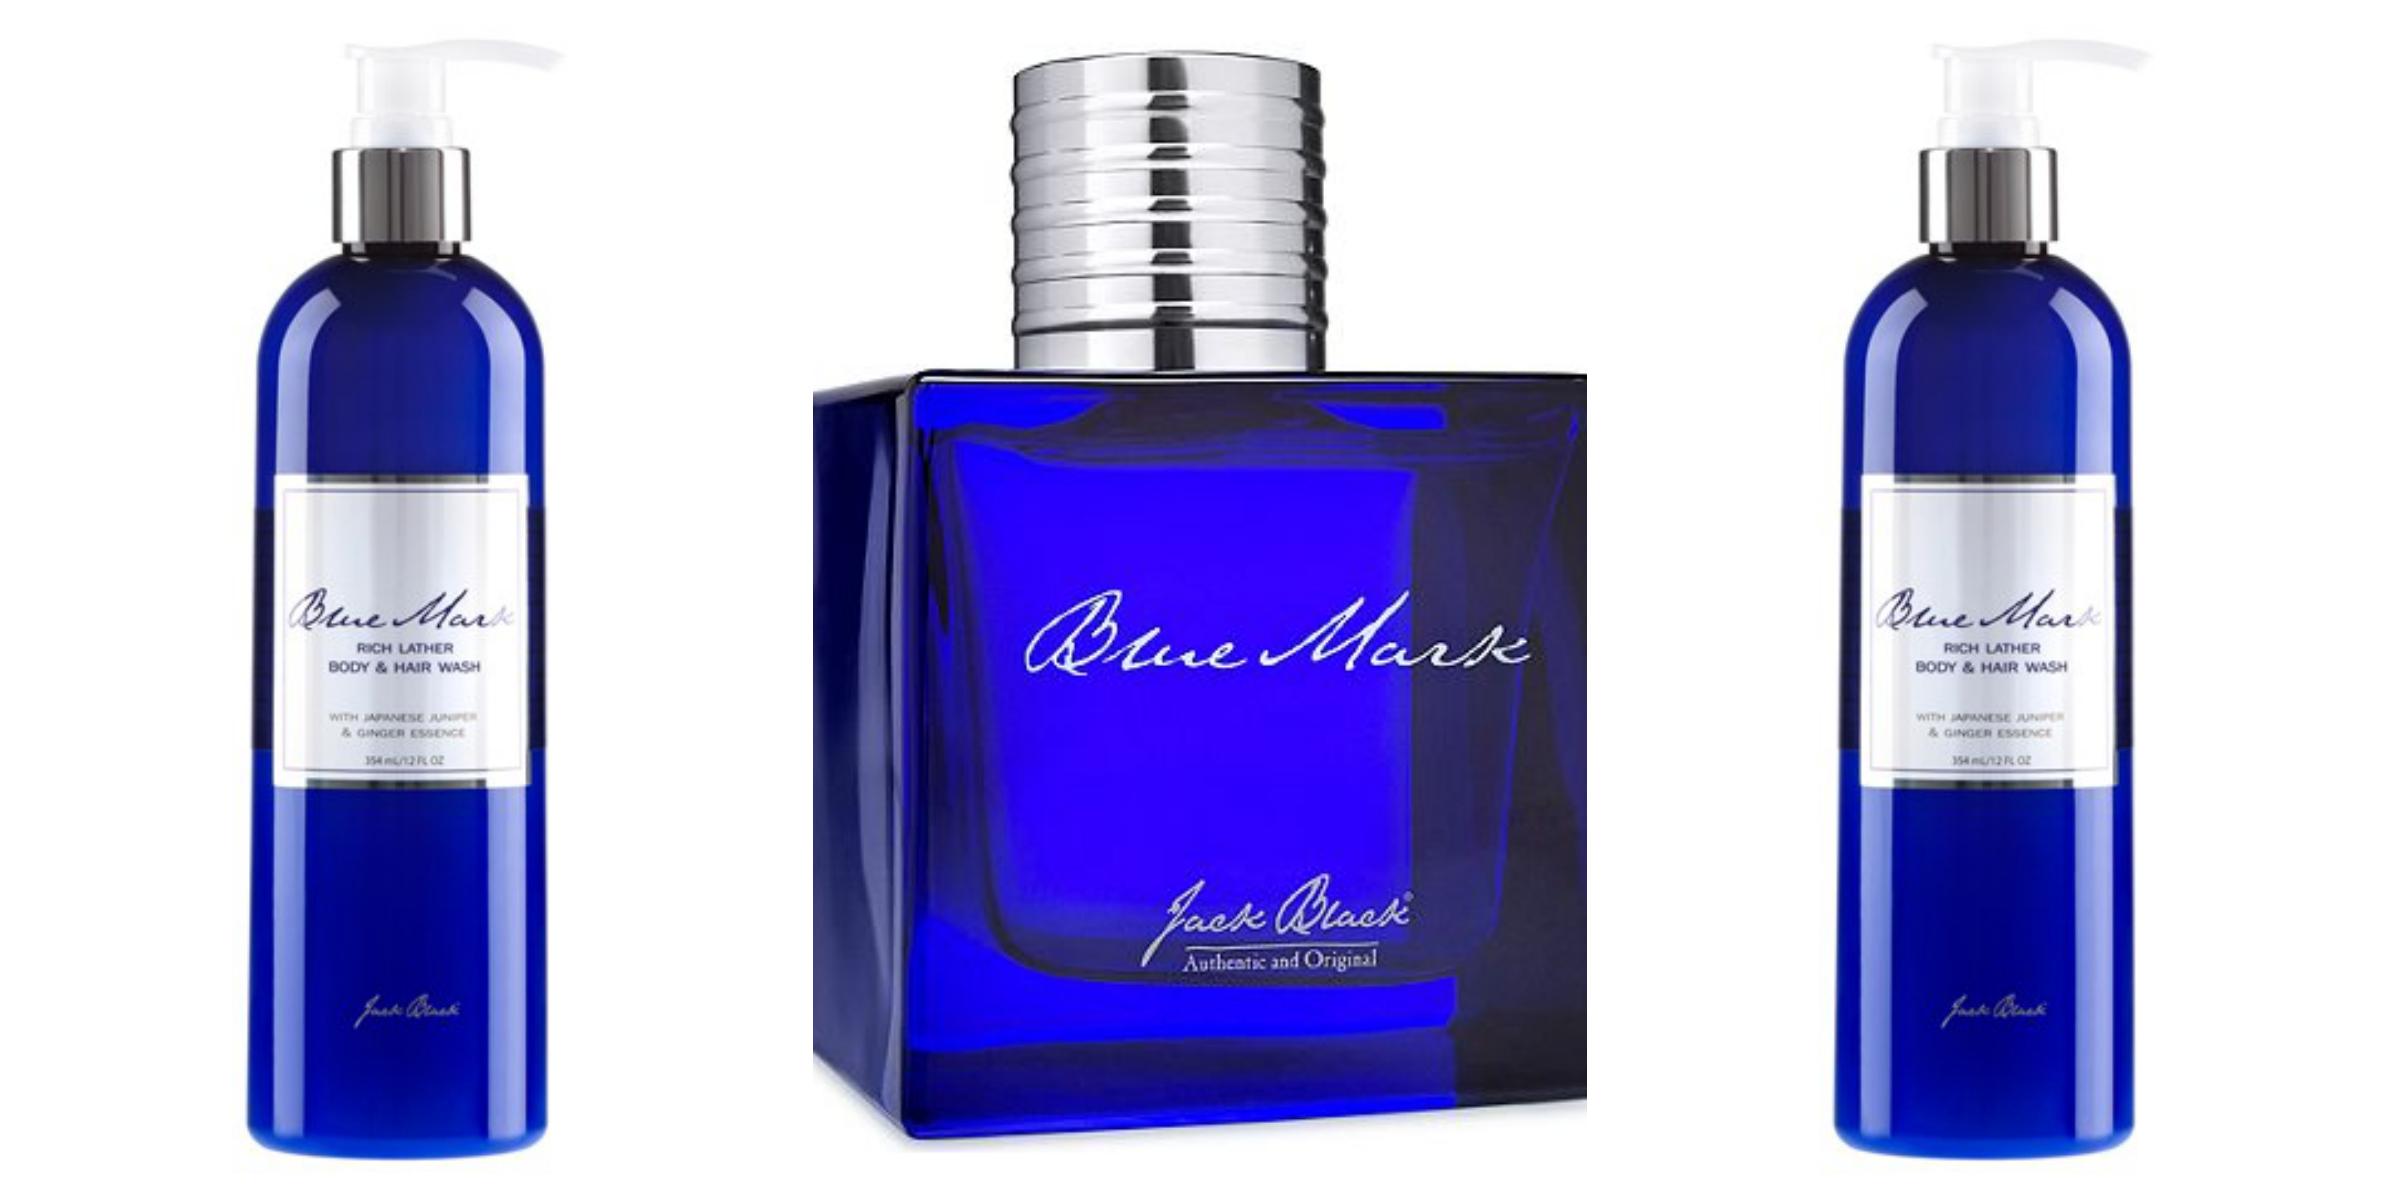 Jack Black Blue Mark Mens cologne new holiday